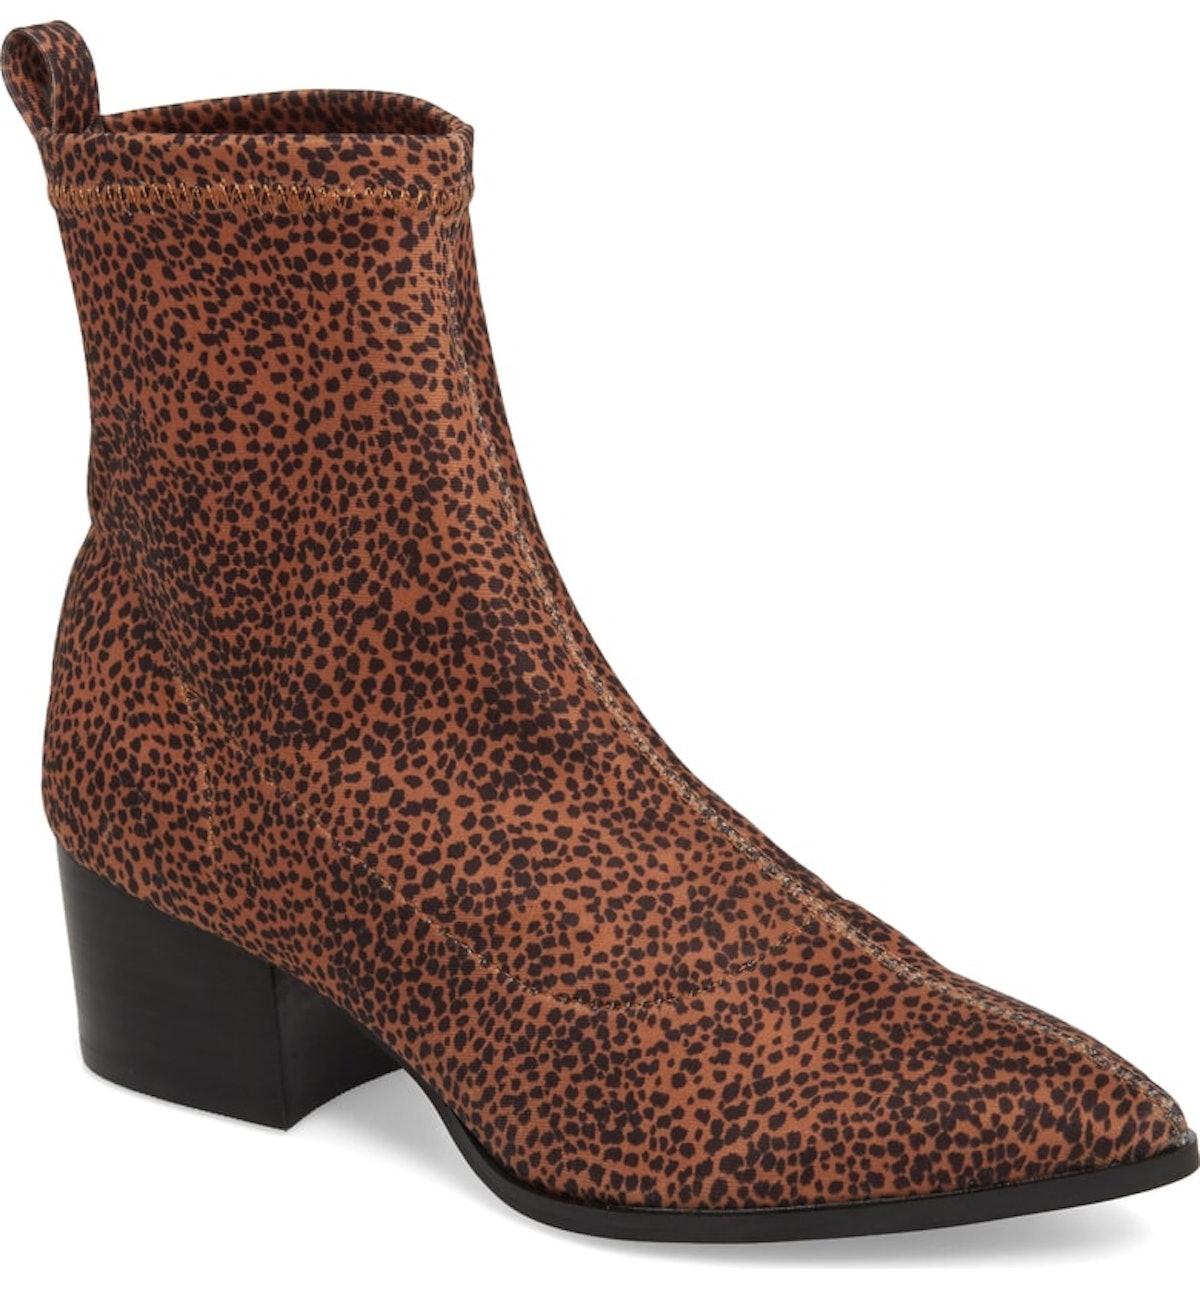 Amuse Society x Matisse Liliana Sock Bootie